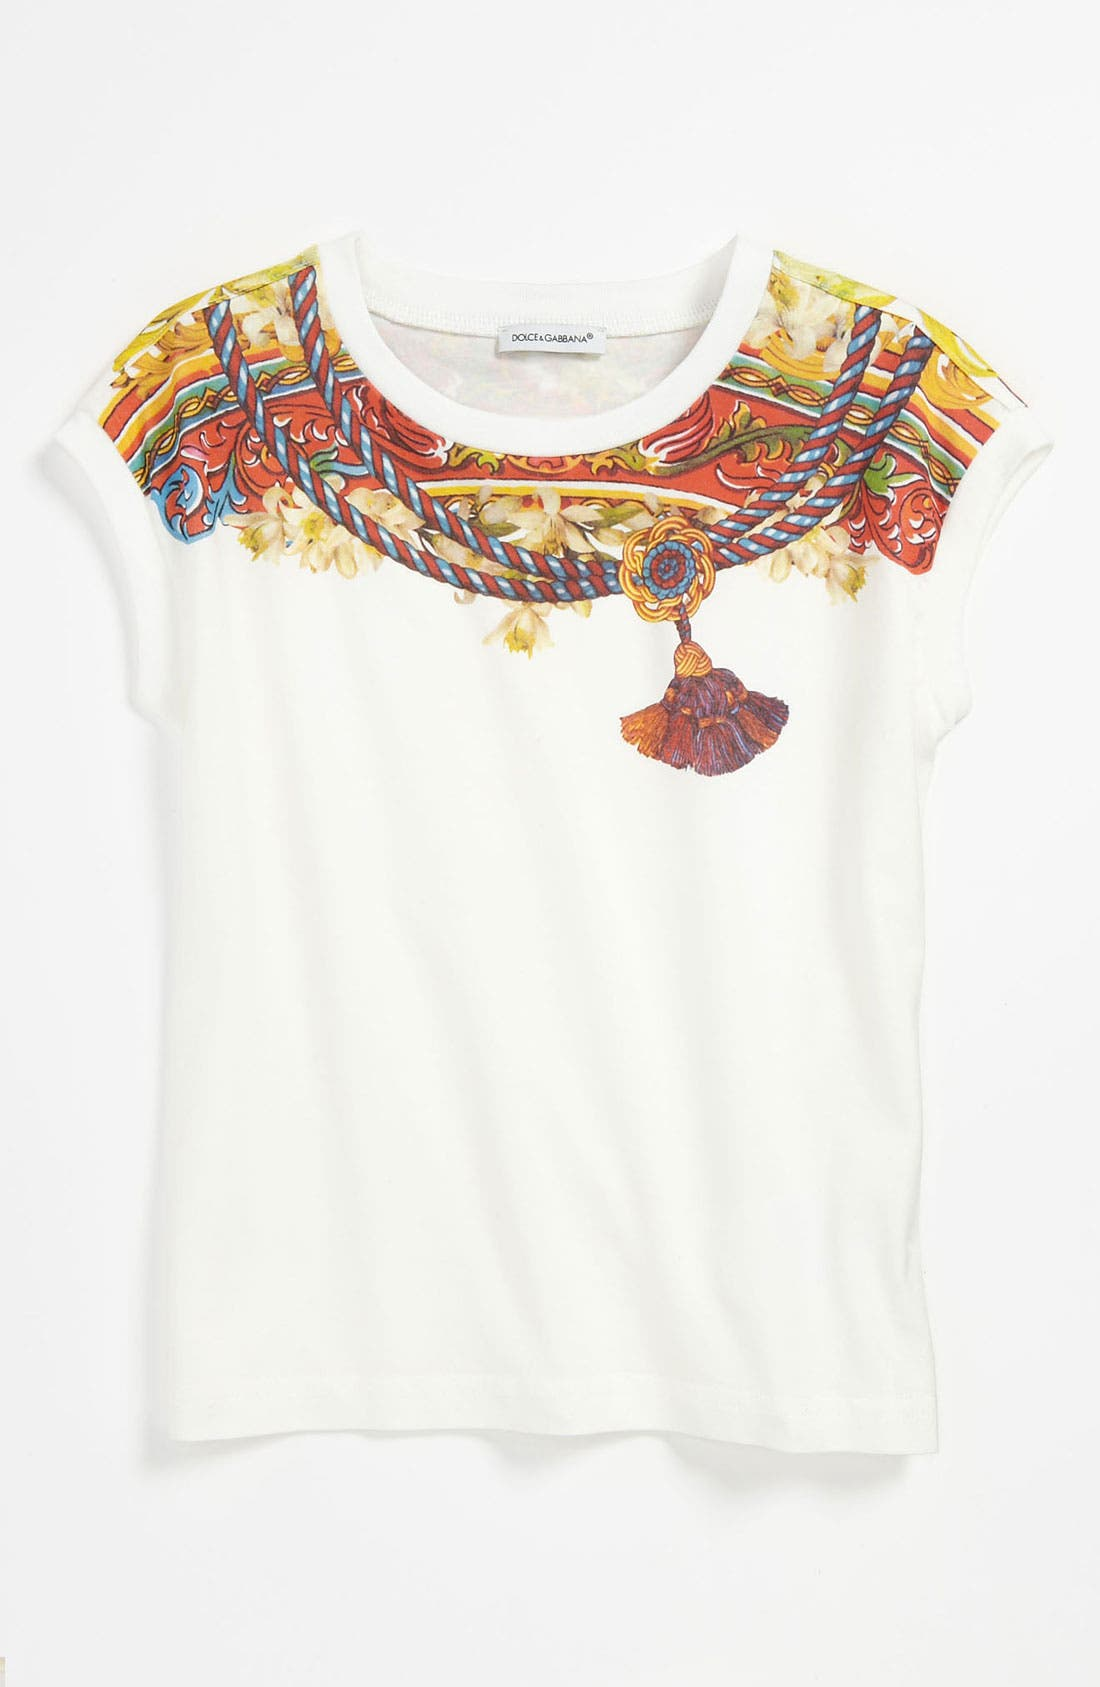 Alternate Image 1 Selected - Dolce&Gabbana 'Sicilia' Jersey Tee (Little Girls & Big Girls)